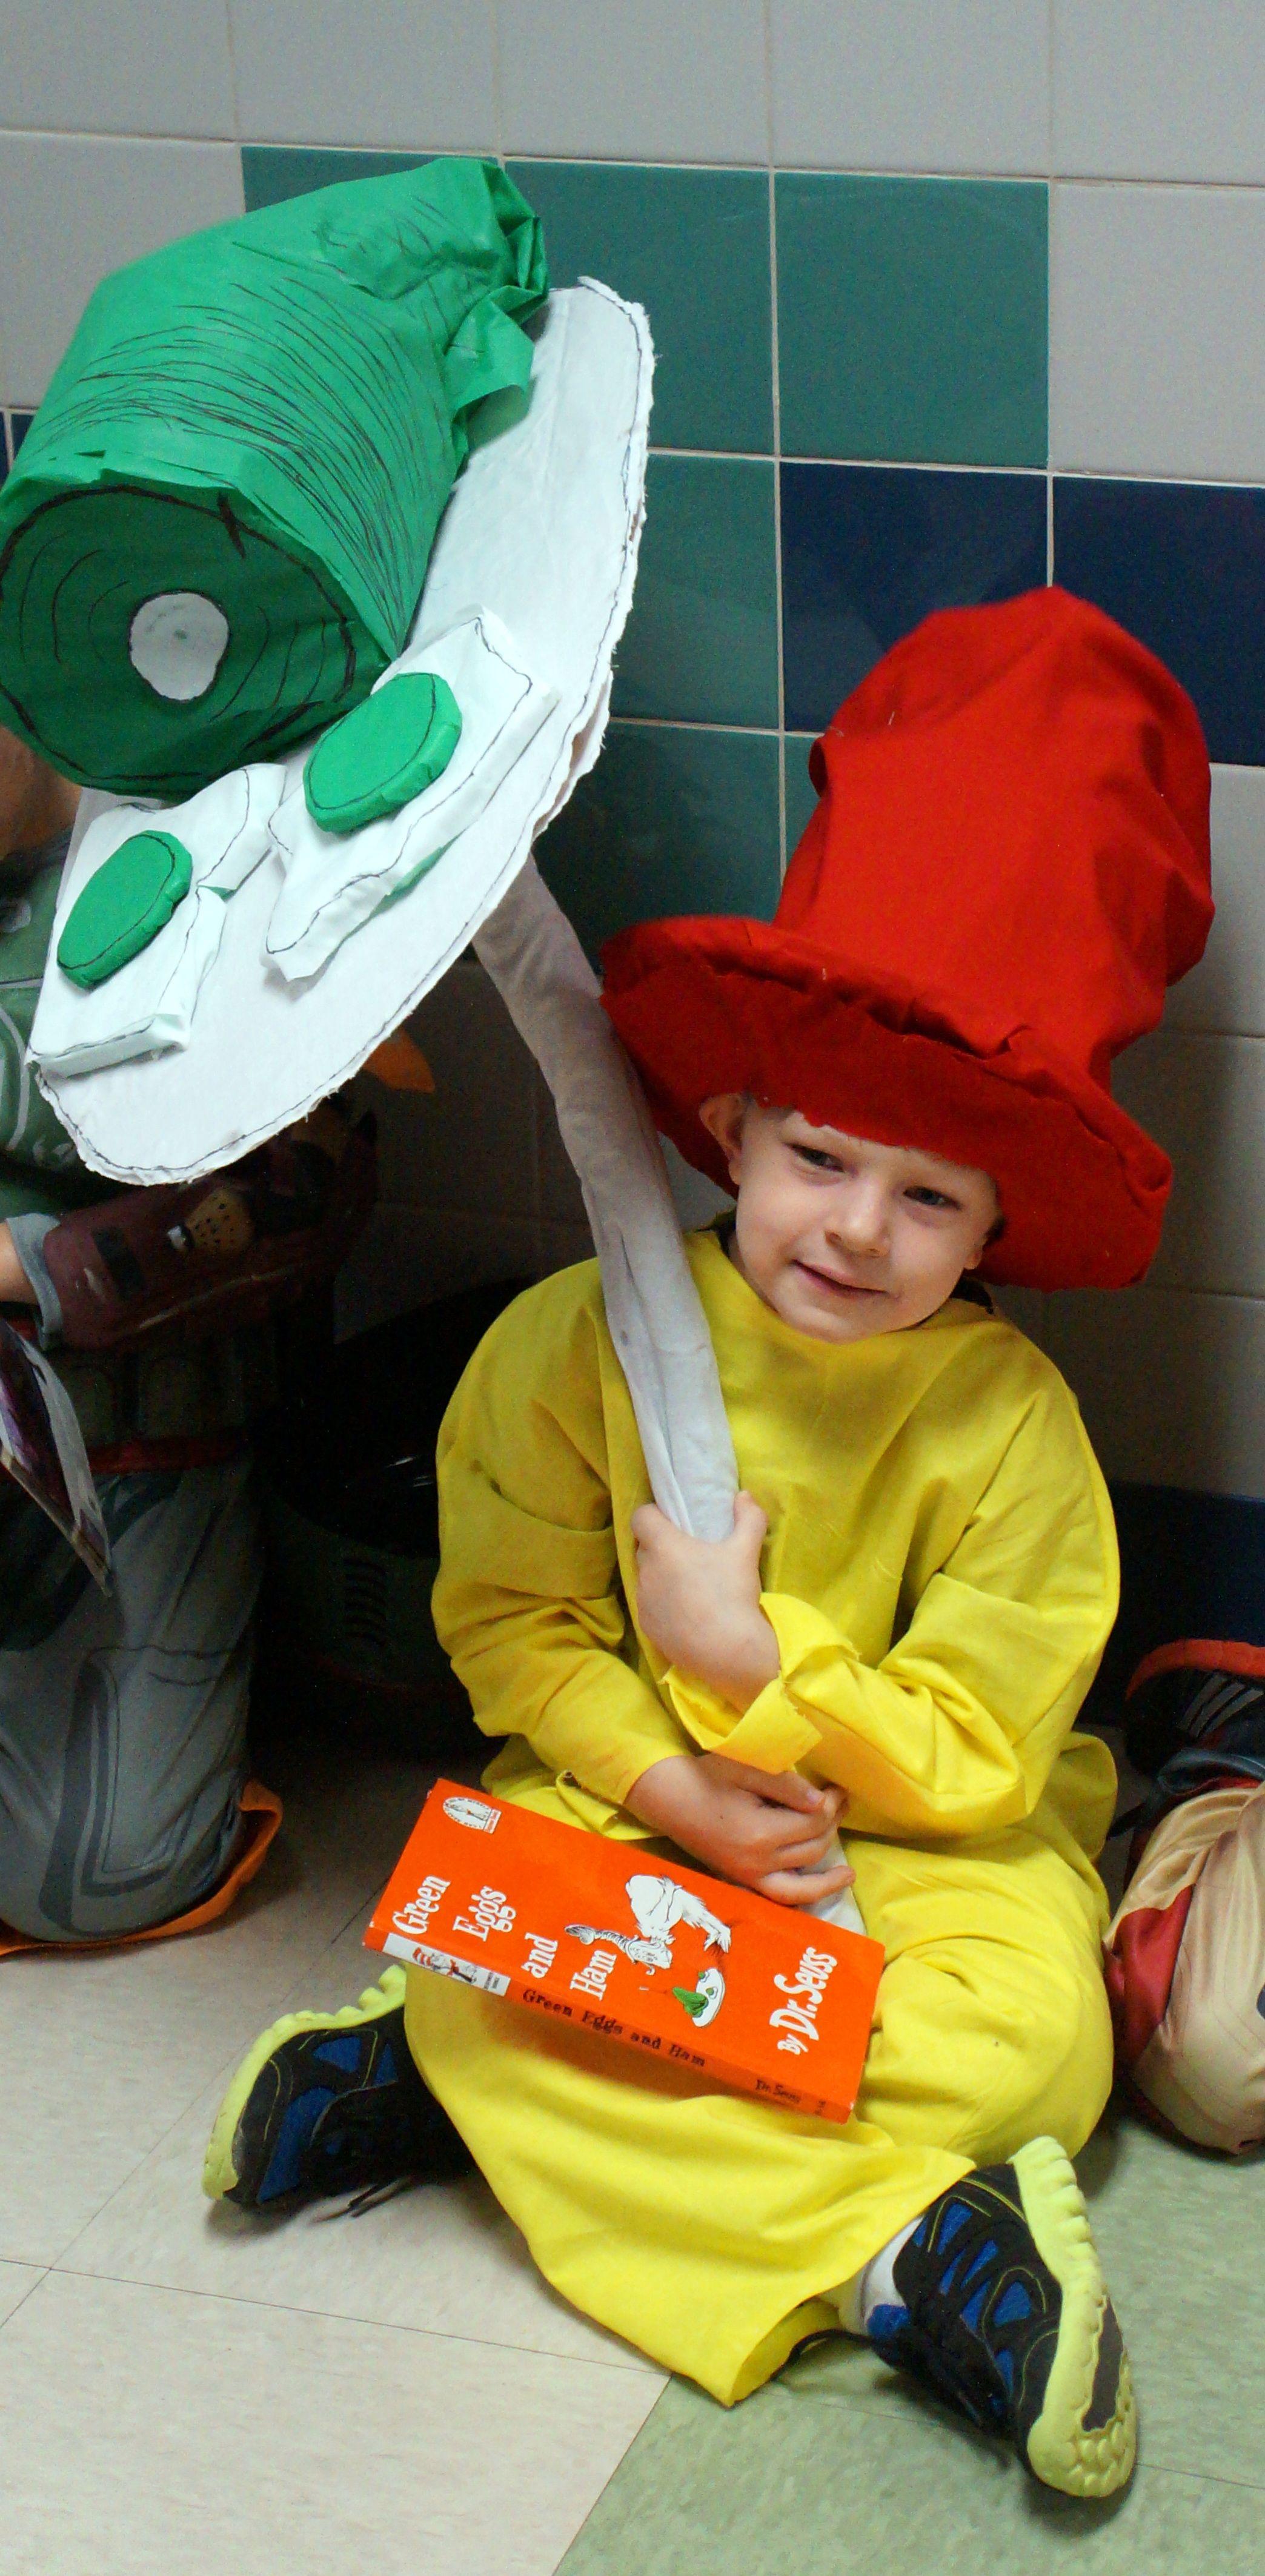 sam i am costume (from green eggs and ham) | kid stuff | pinterest